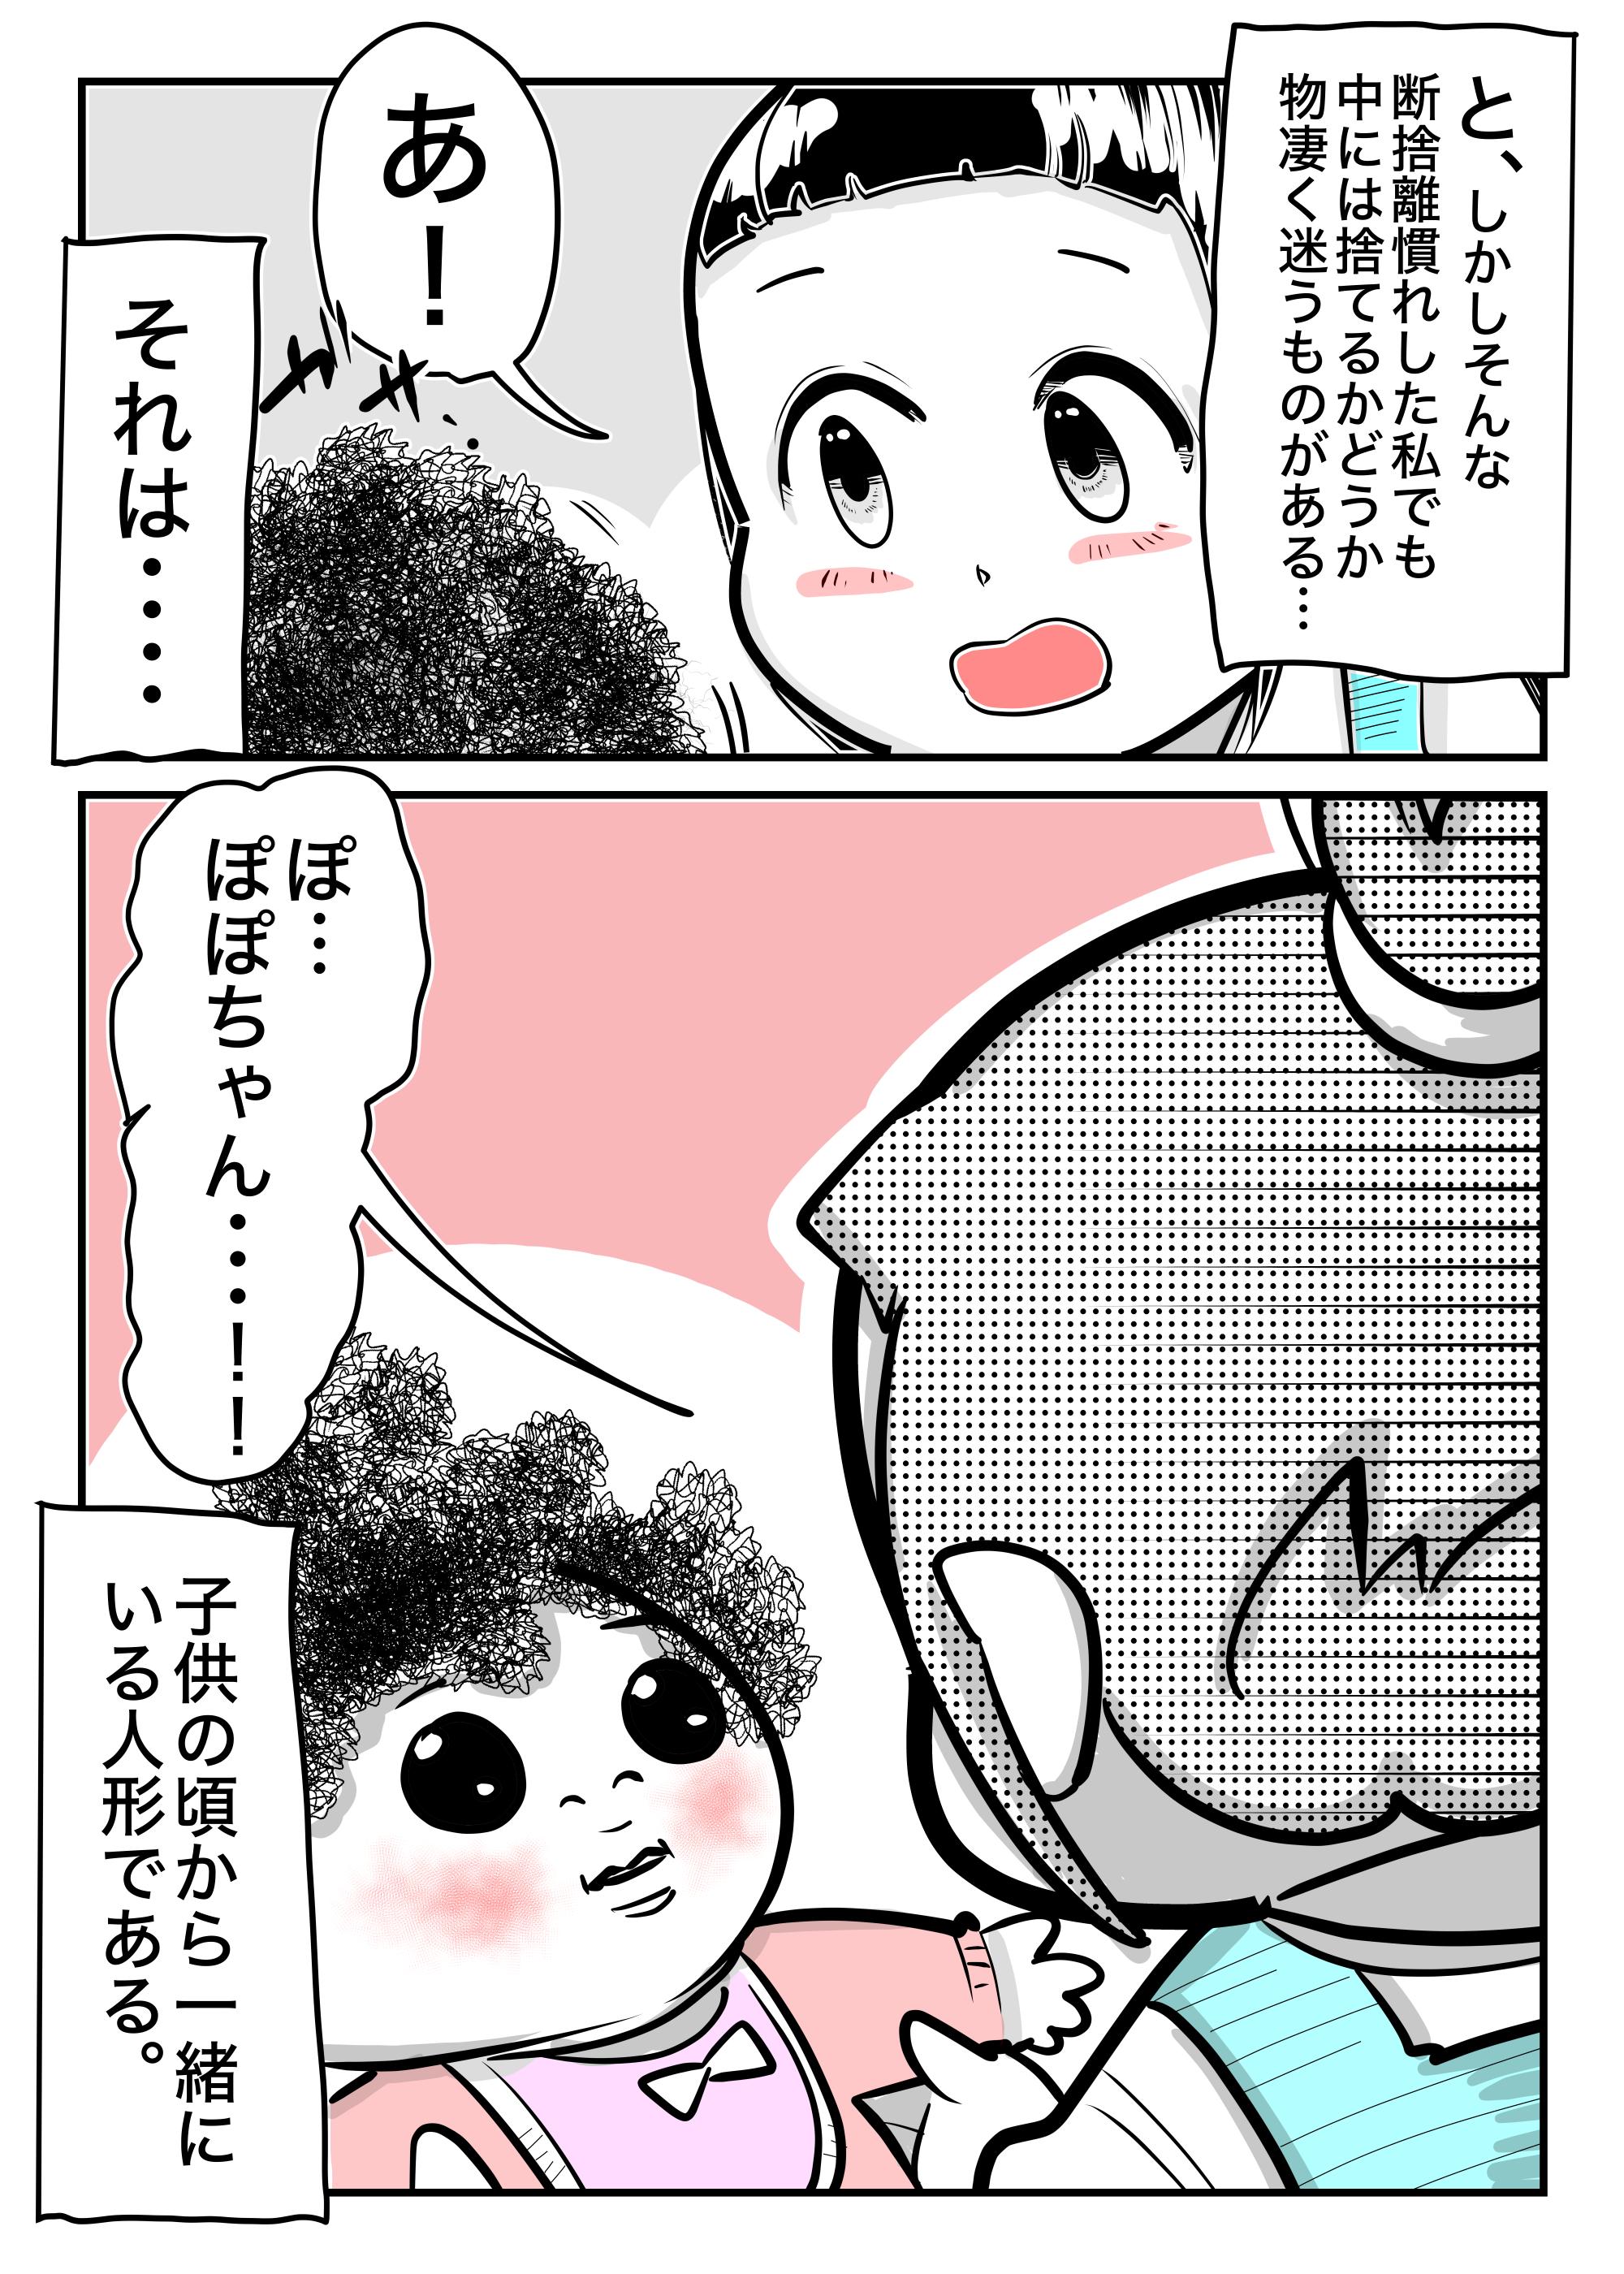 f:id:terashimaru117:20210911051656p:plain